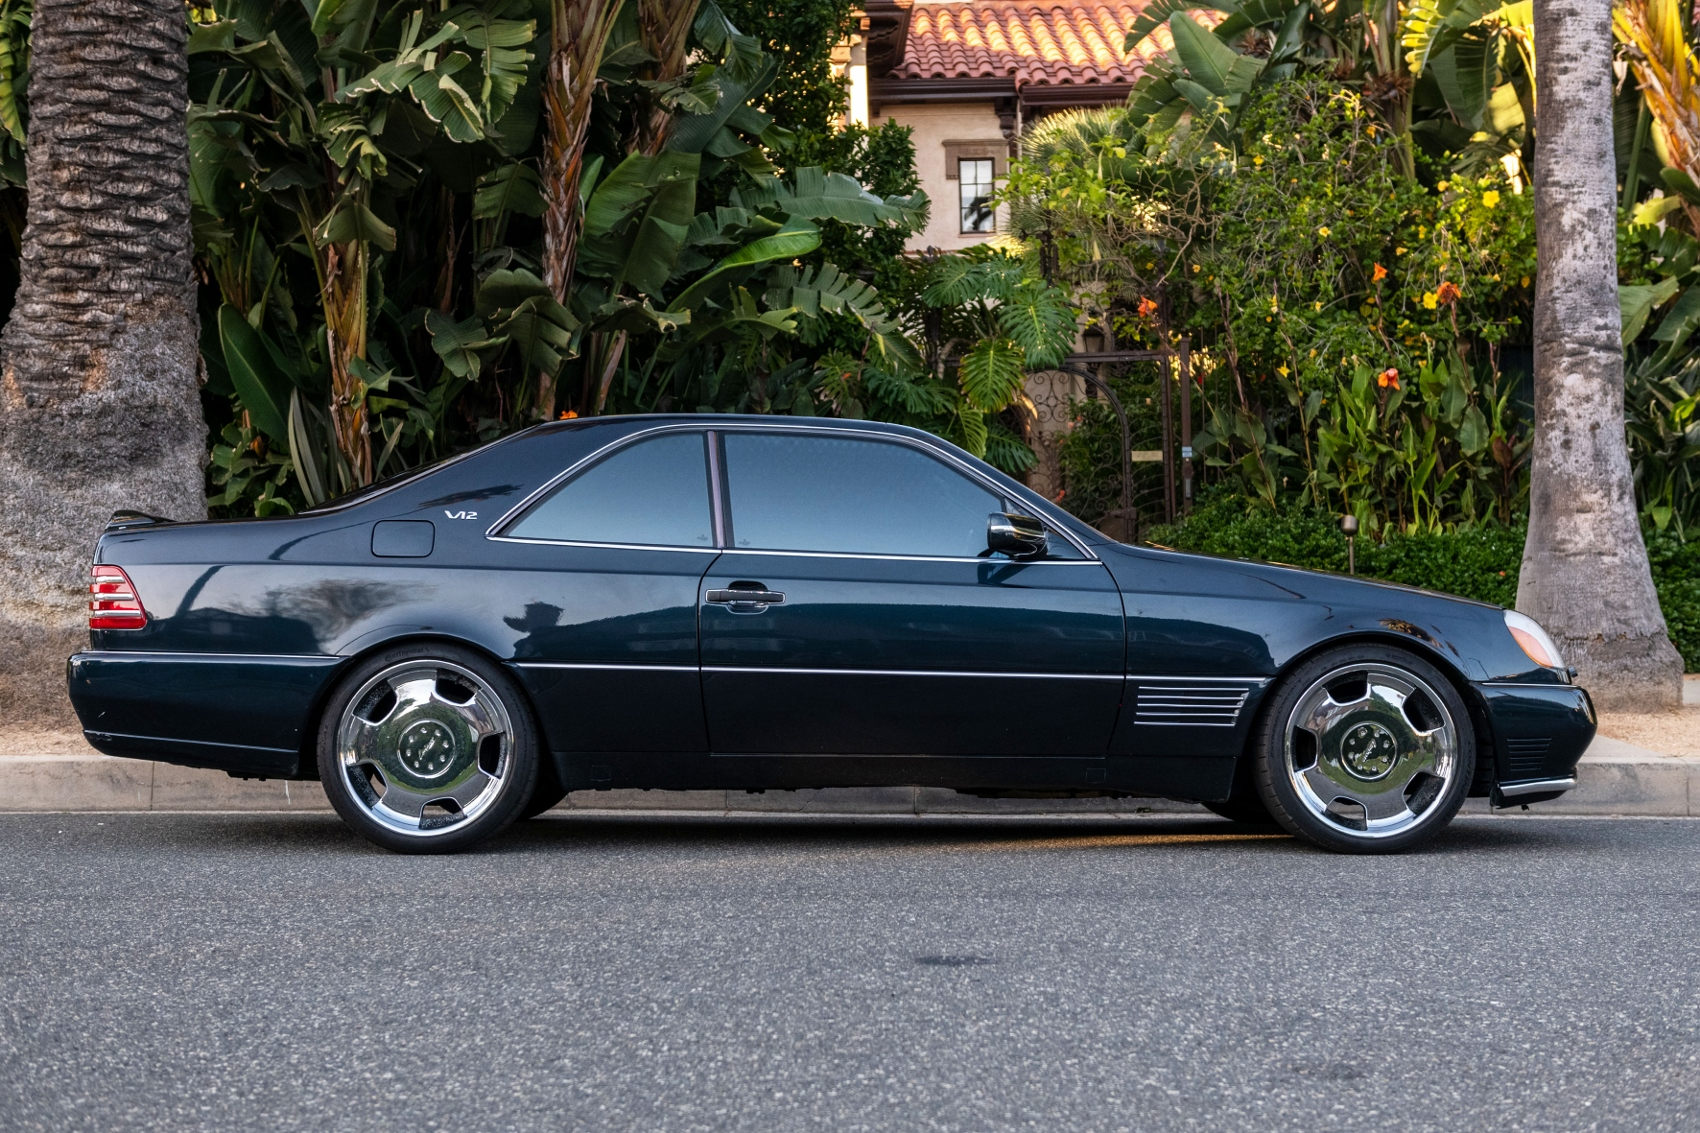 Pozrite si Mercedes S600 Michaela Jordana z roku 1996 hRcyXtlZ6N lorinsercl600ex-jordanside1sbeverly